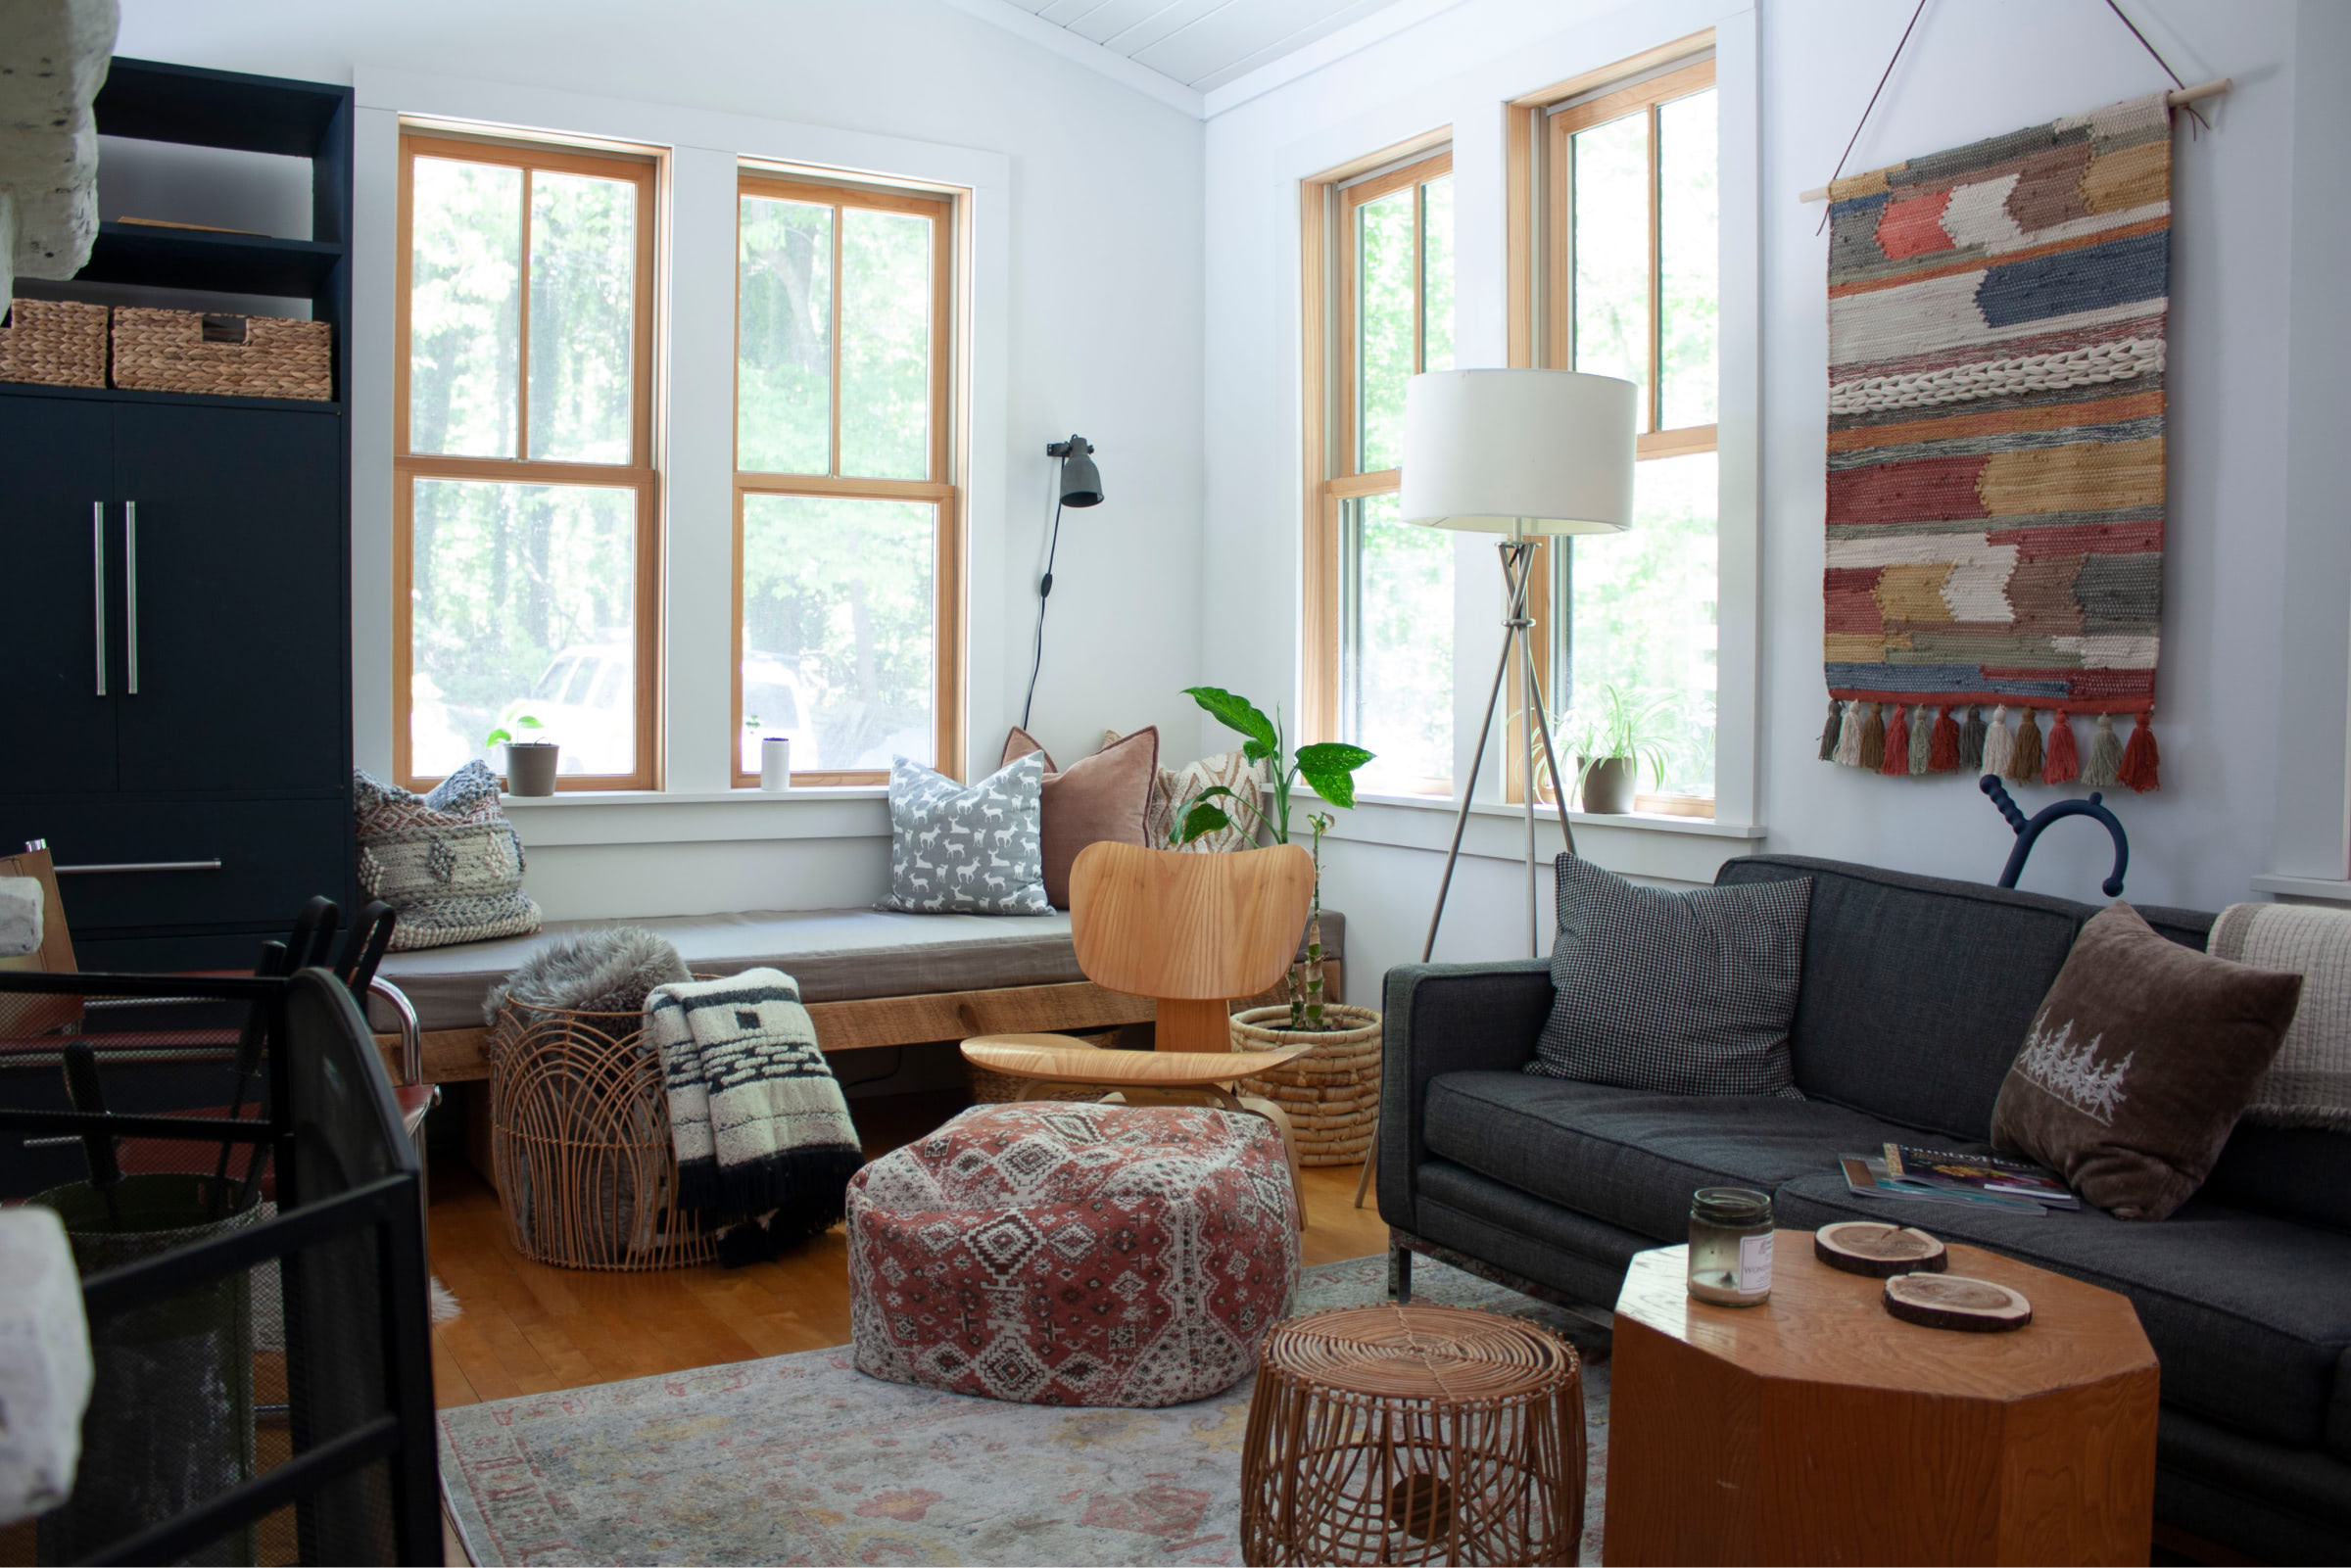 Kanuga farmhouse interior shot of the living room